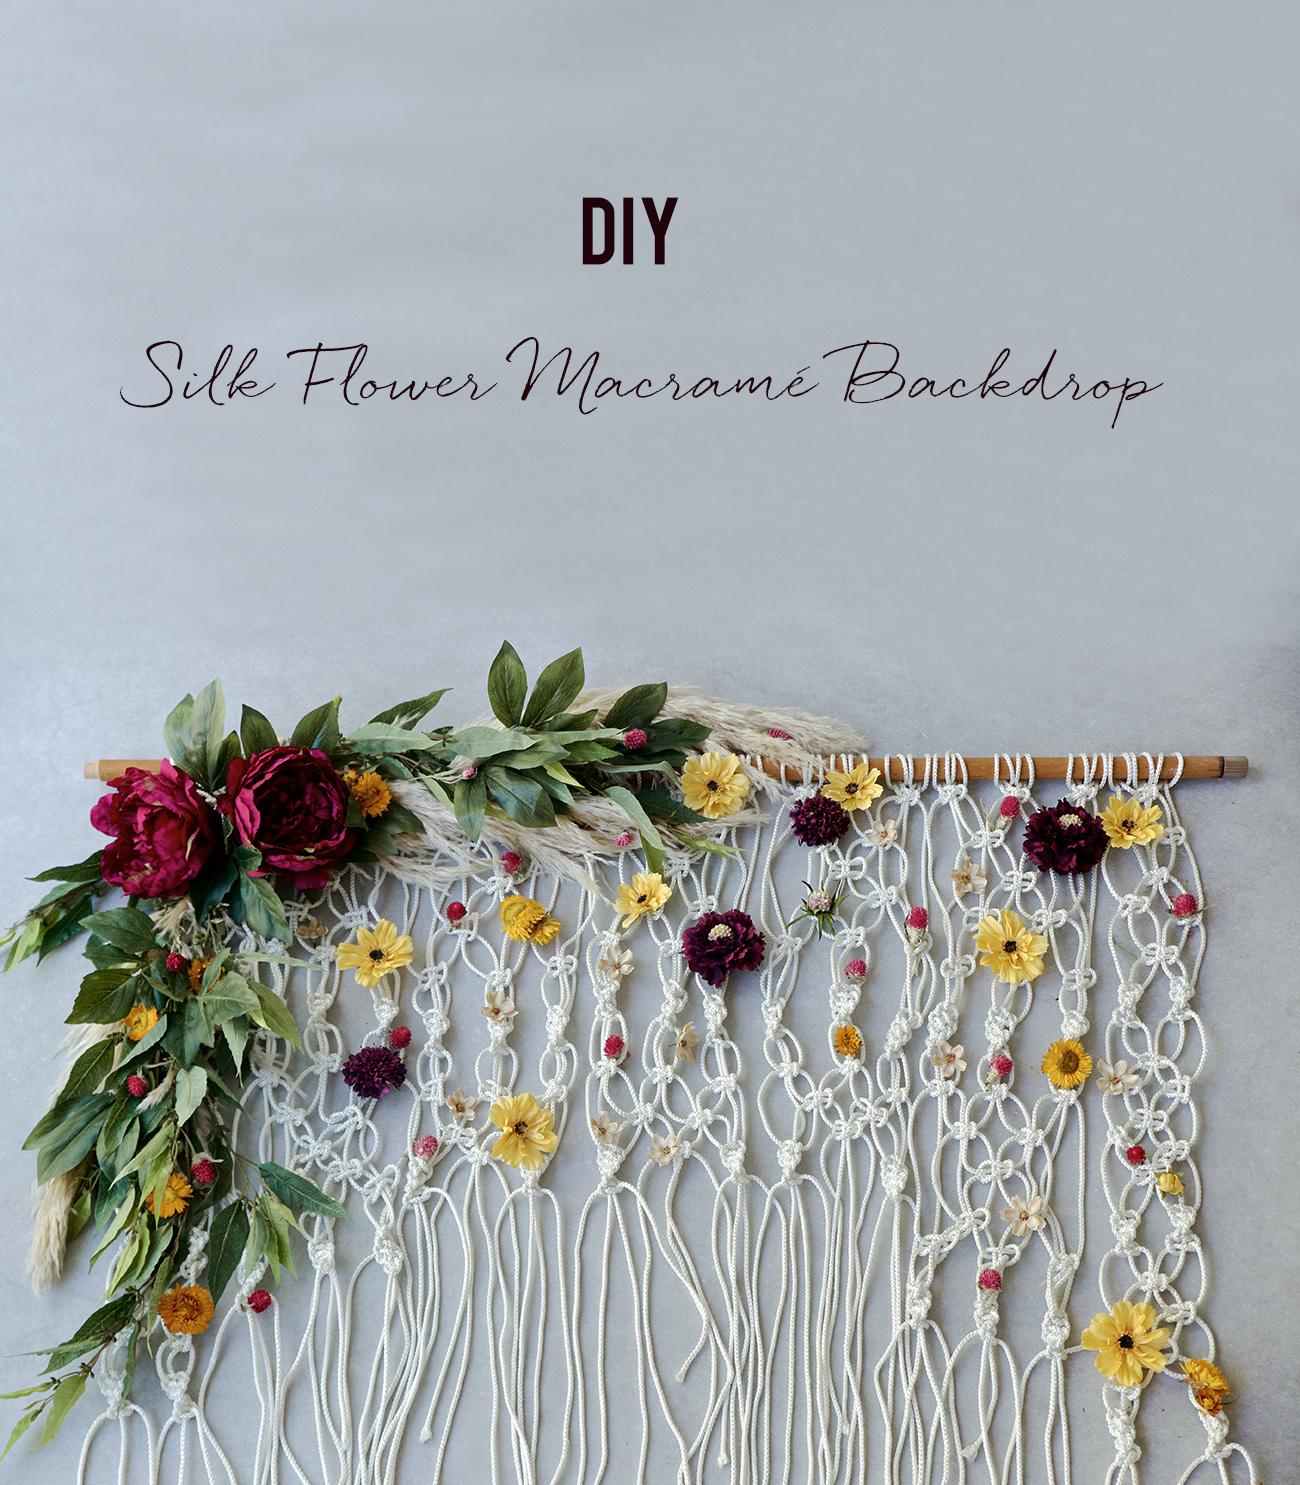 diy silk flower macrame backdrop